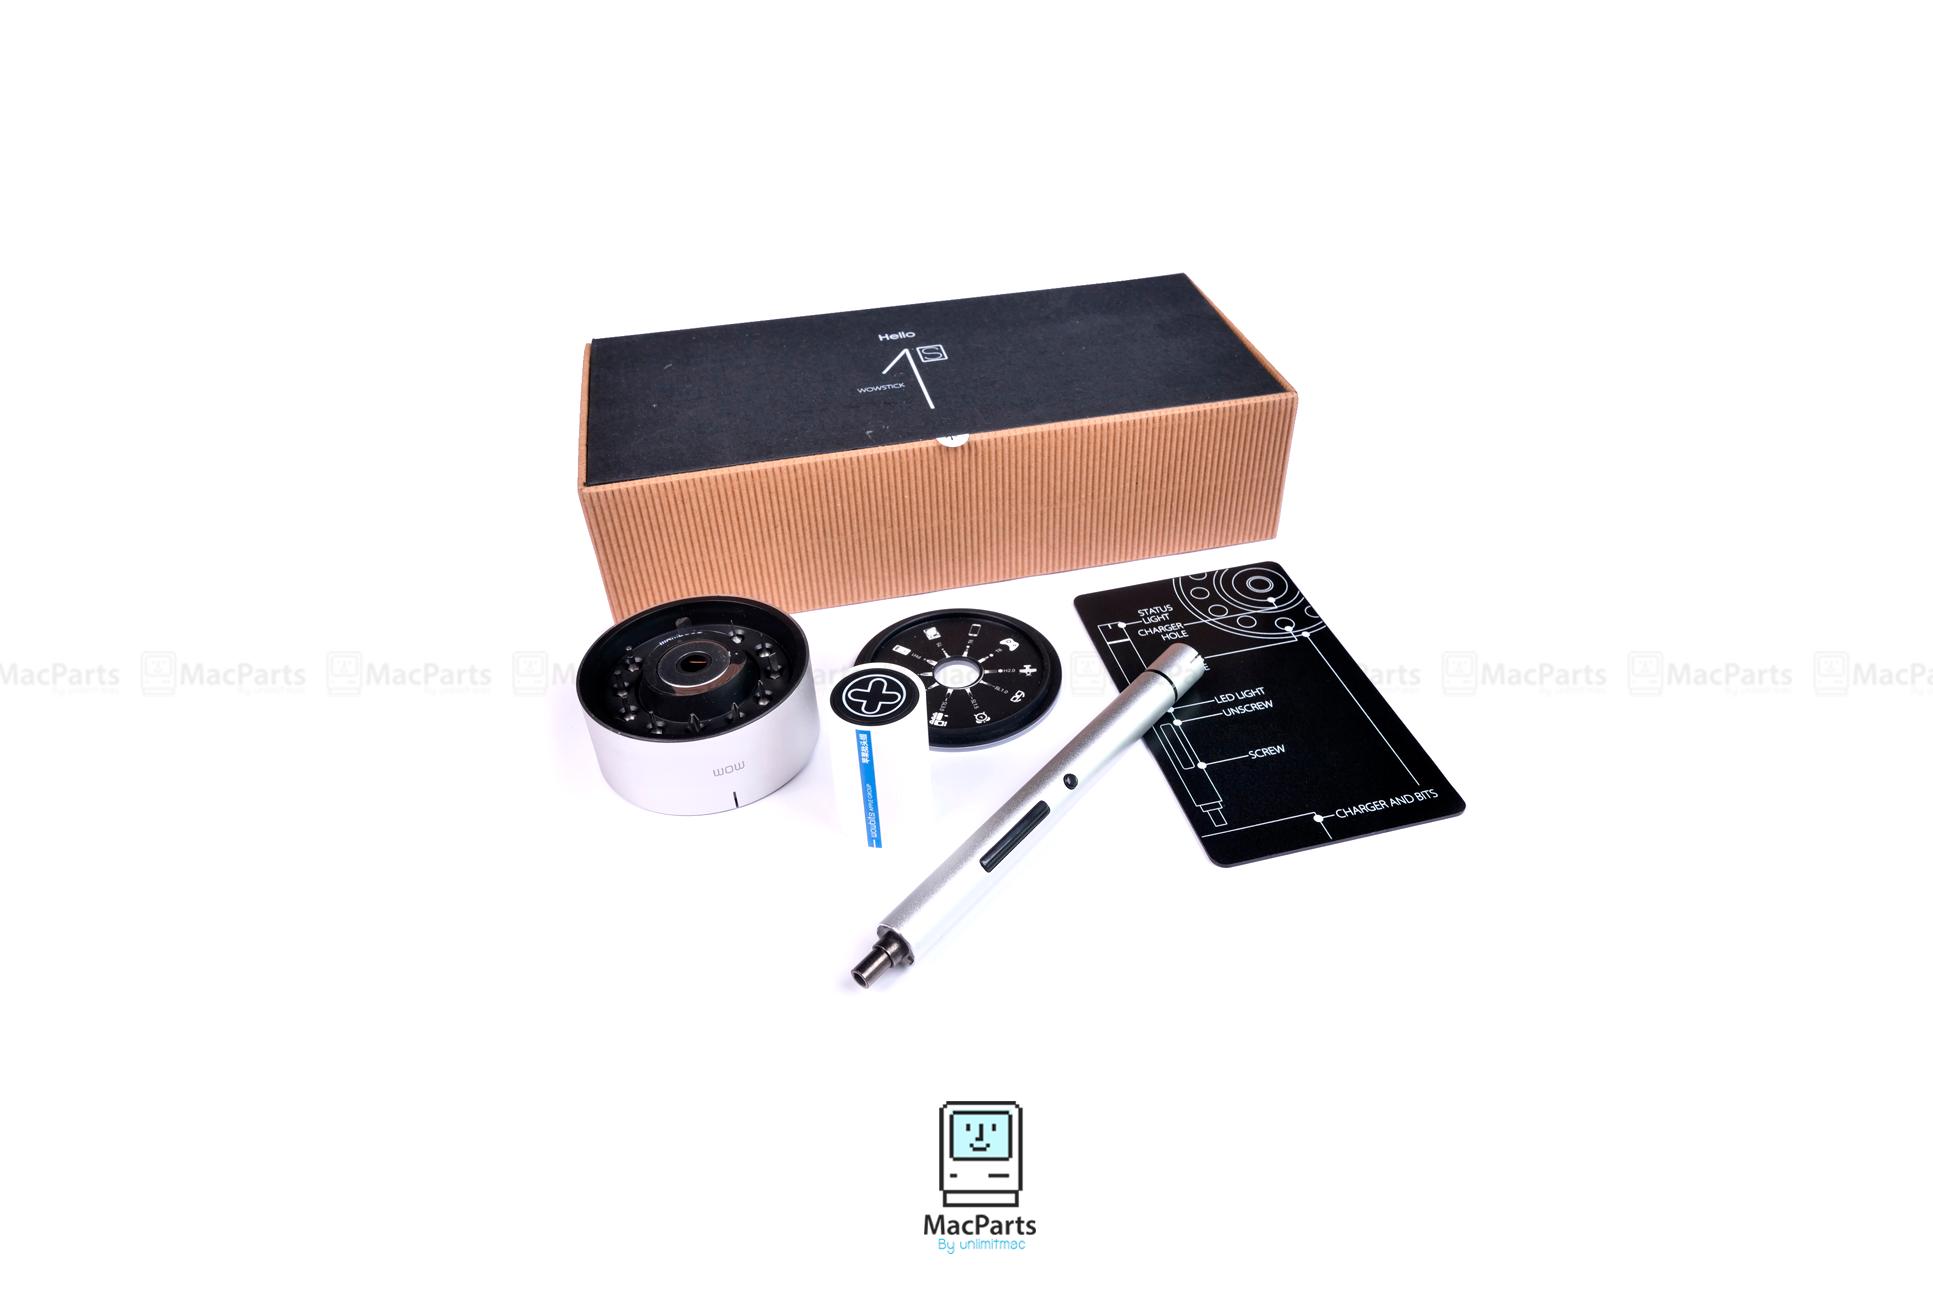 Wowtation Wowstick 1S Mini Cordless Electric Power Screwdriver With Automatic Manual Dual ไขควงไฟฟ้าไร้สายแบบพกพาขนาดเล็ก